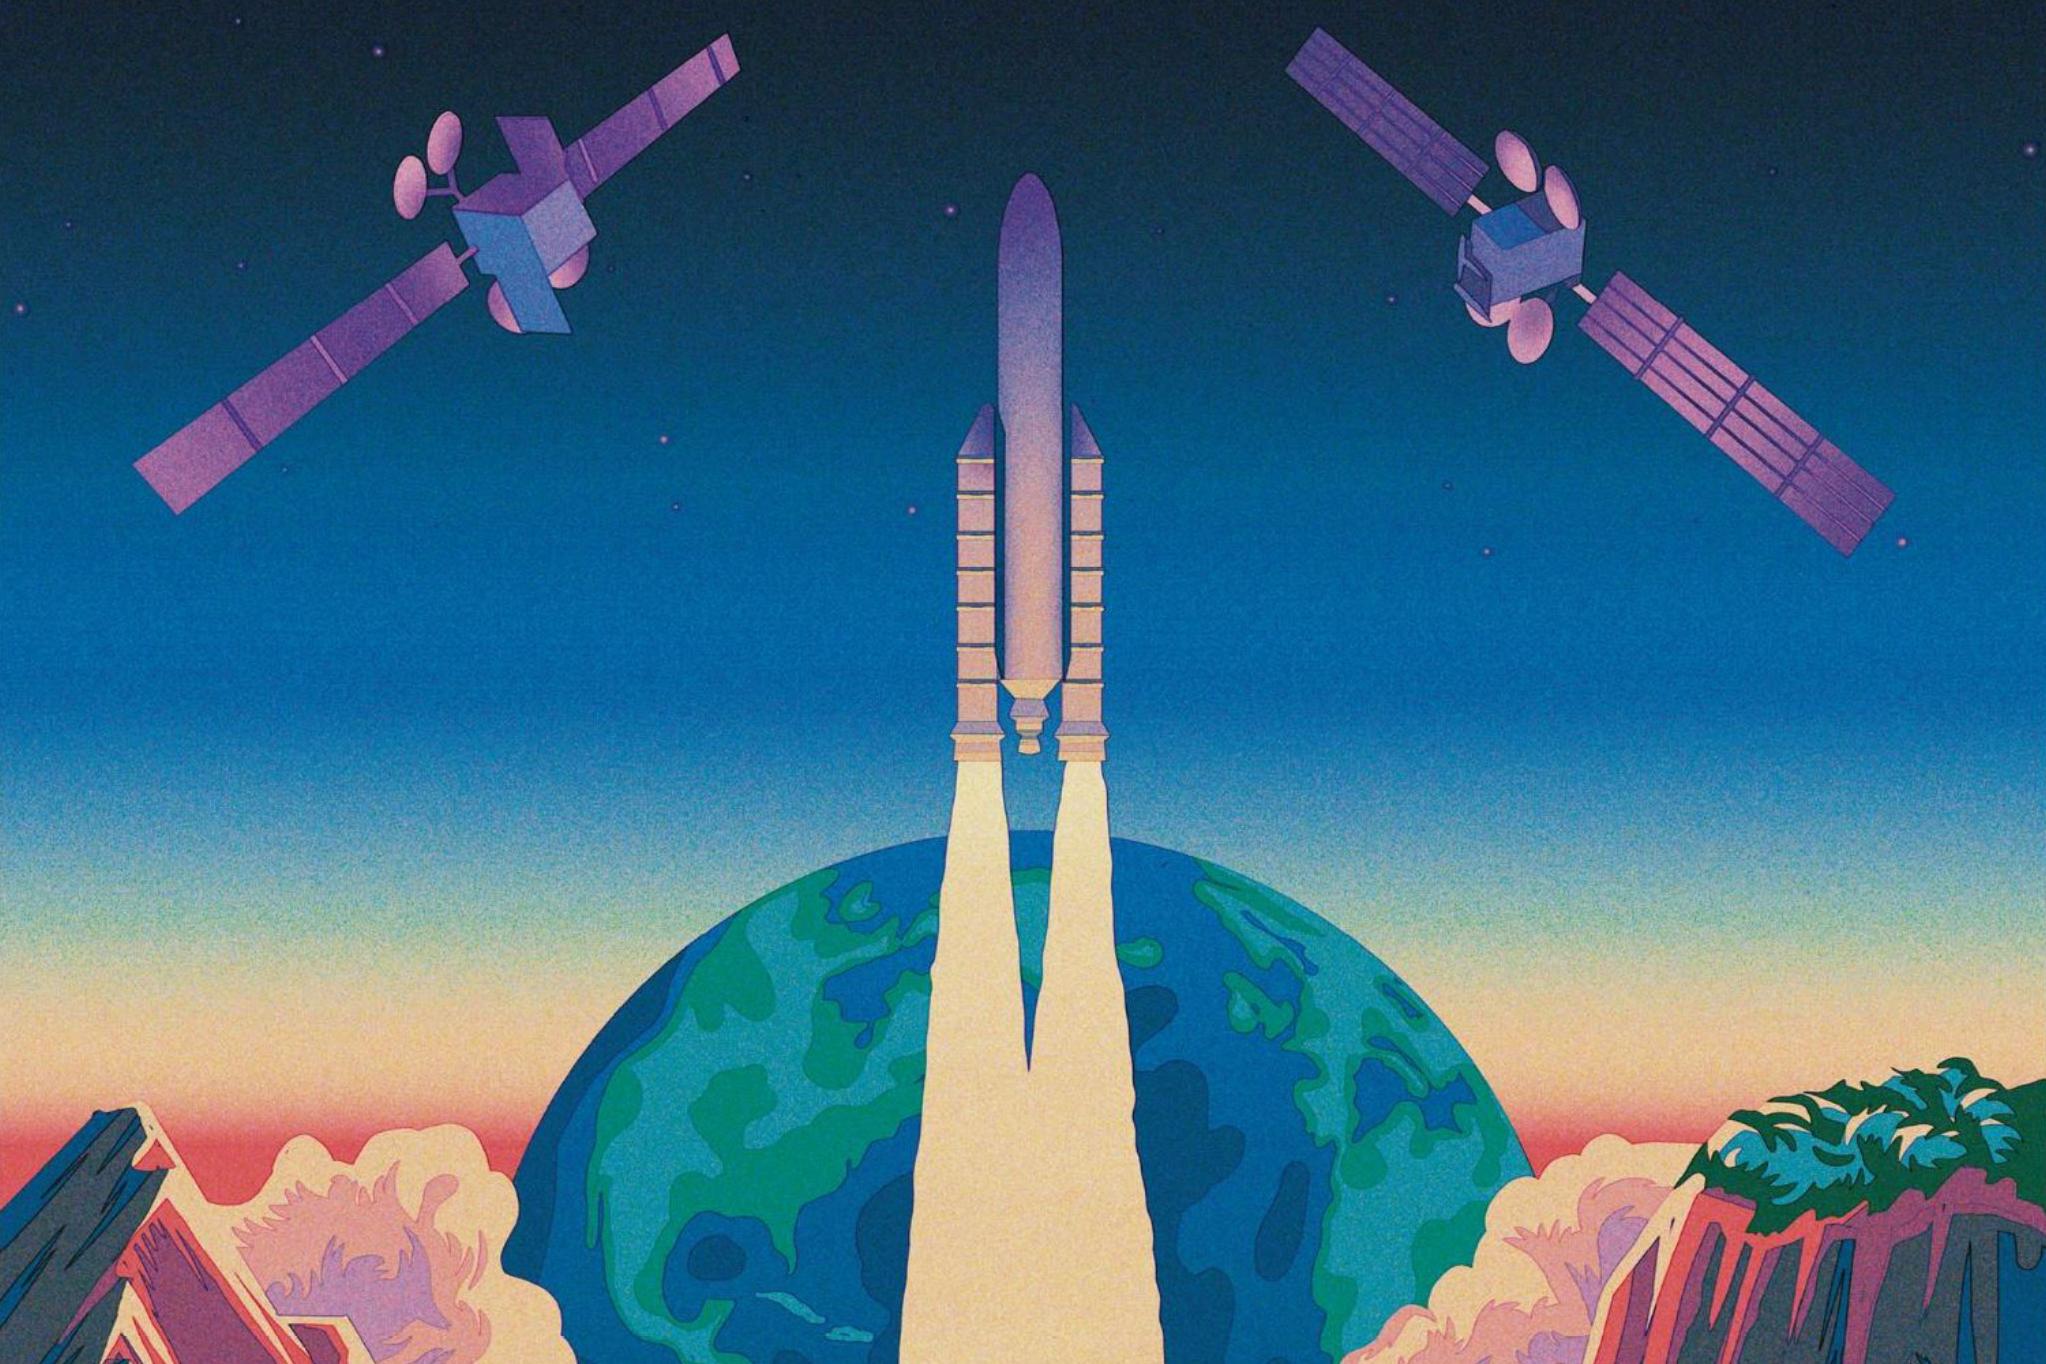 Idag lyfter Ariane 5s hundrade raket